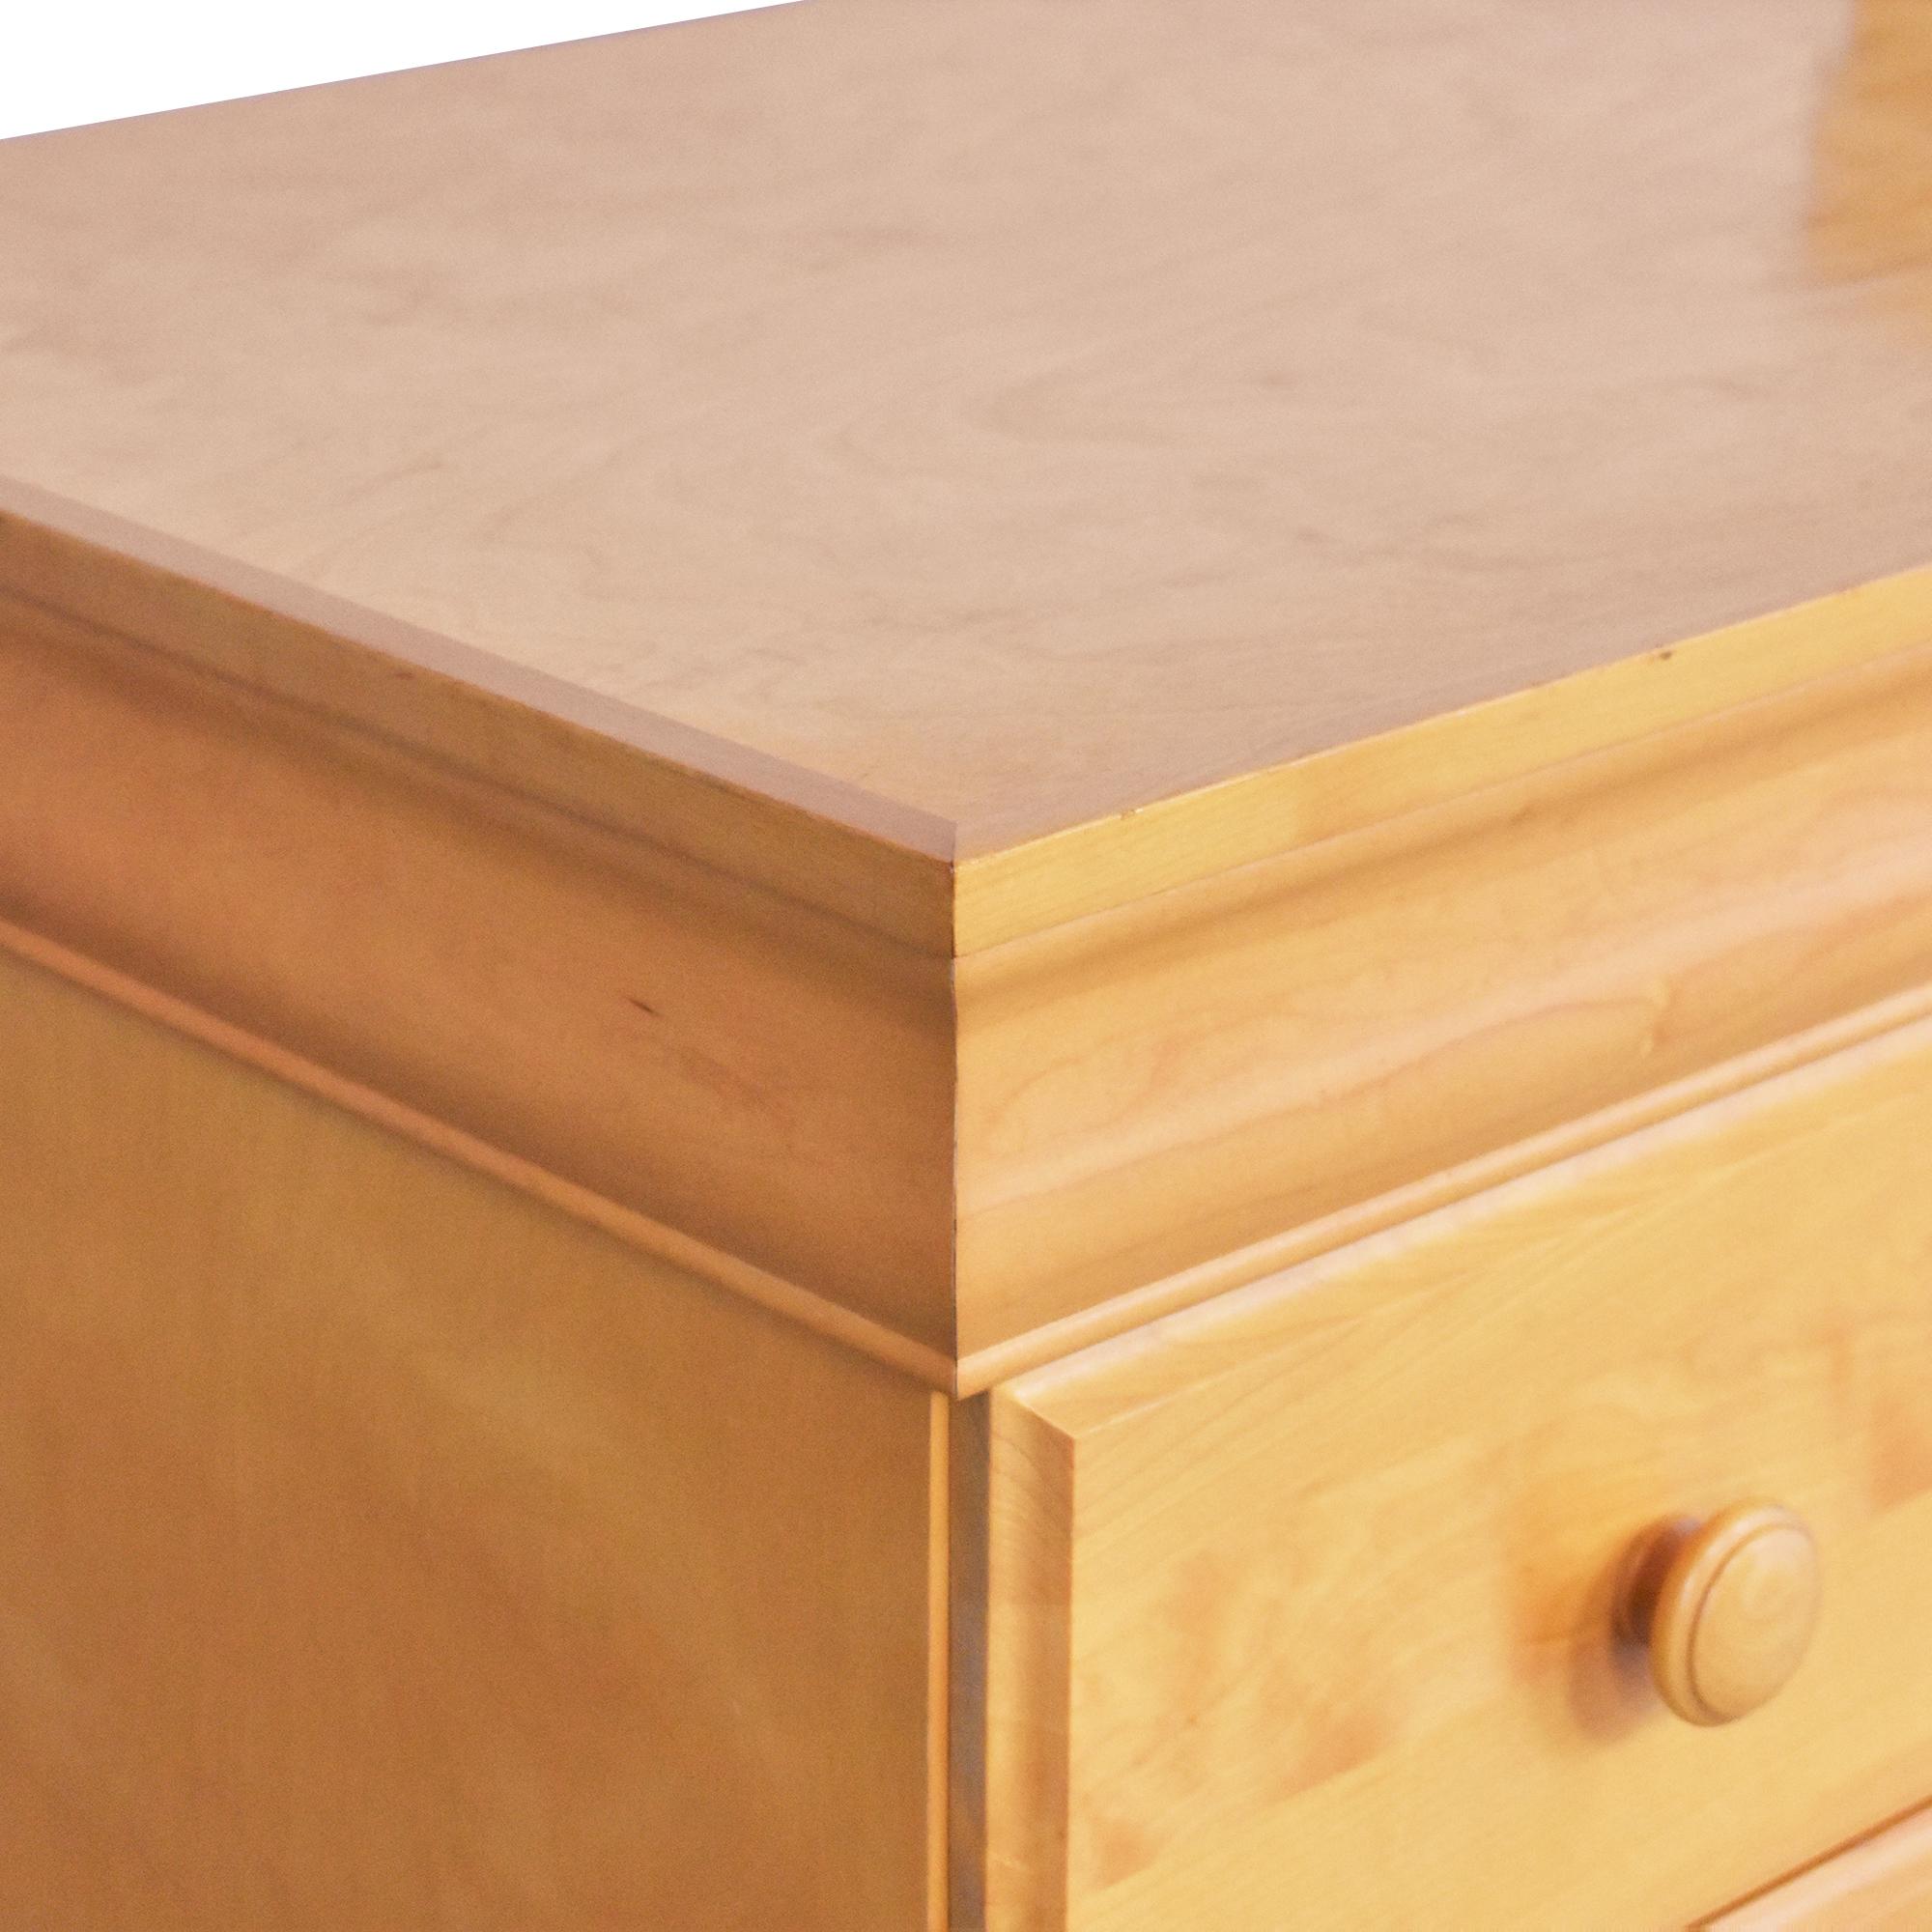 Bonavita Bonavita Changing Table Dresser ct